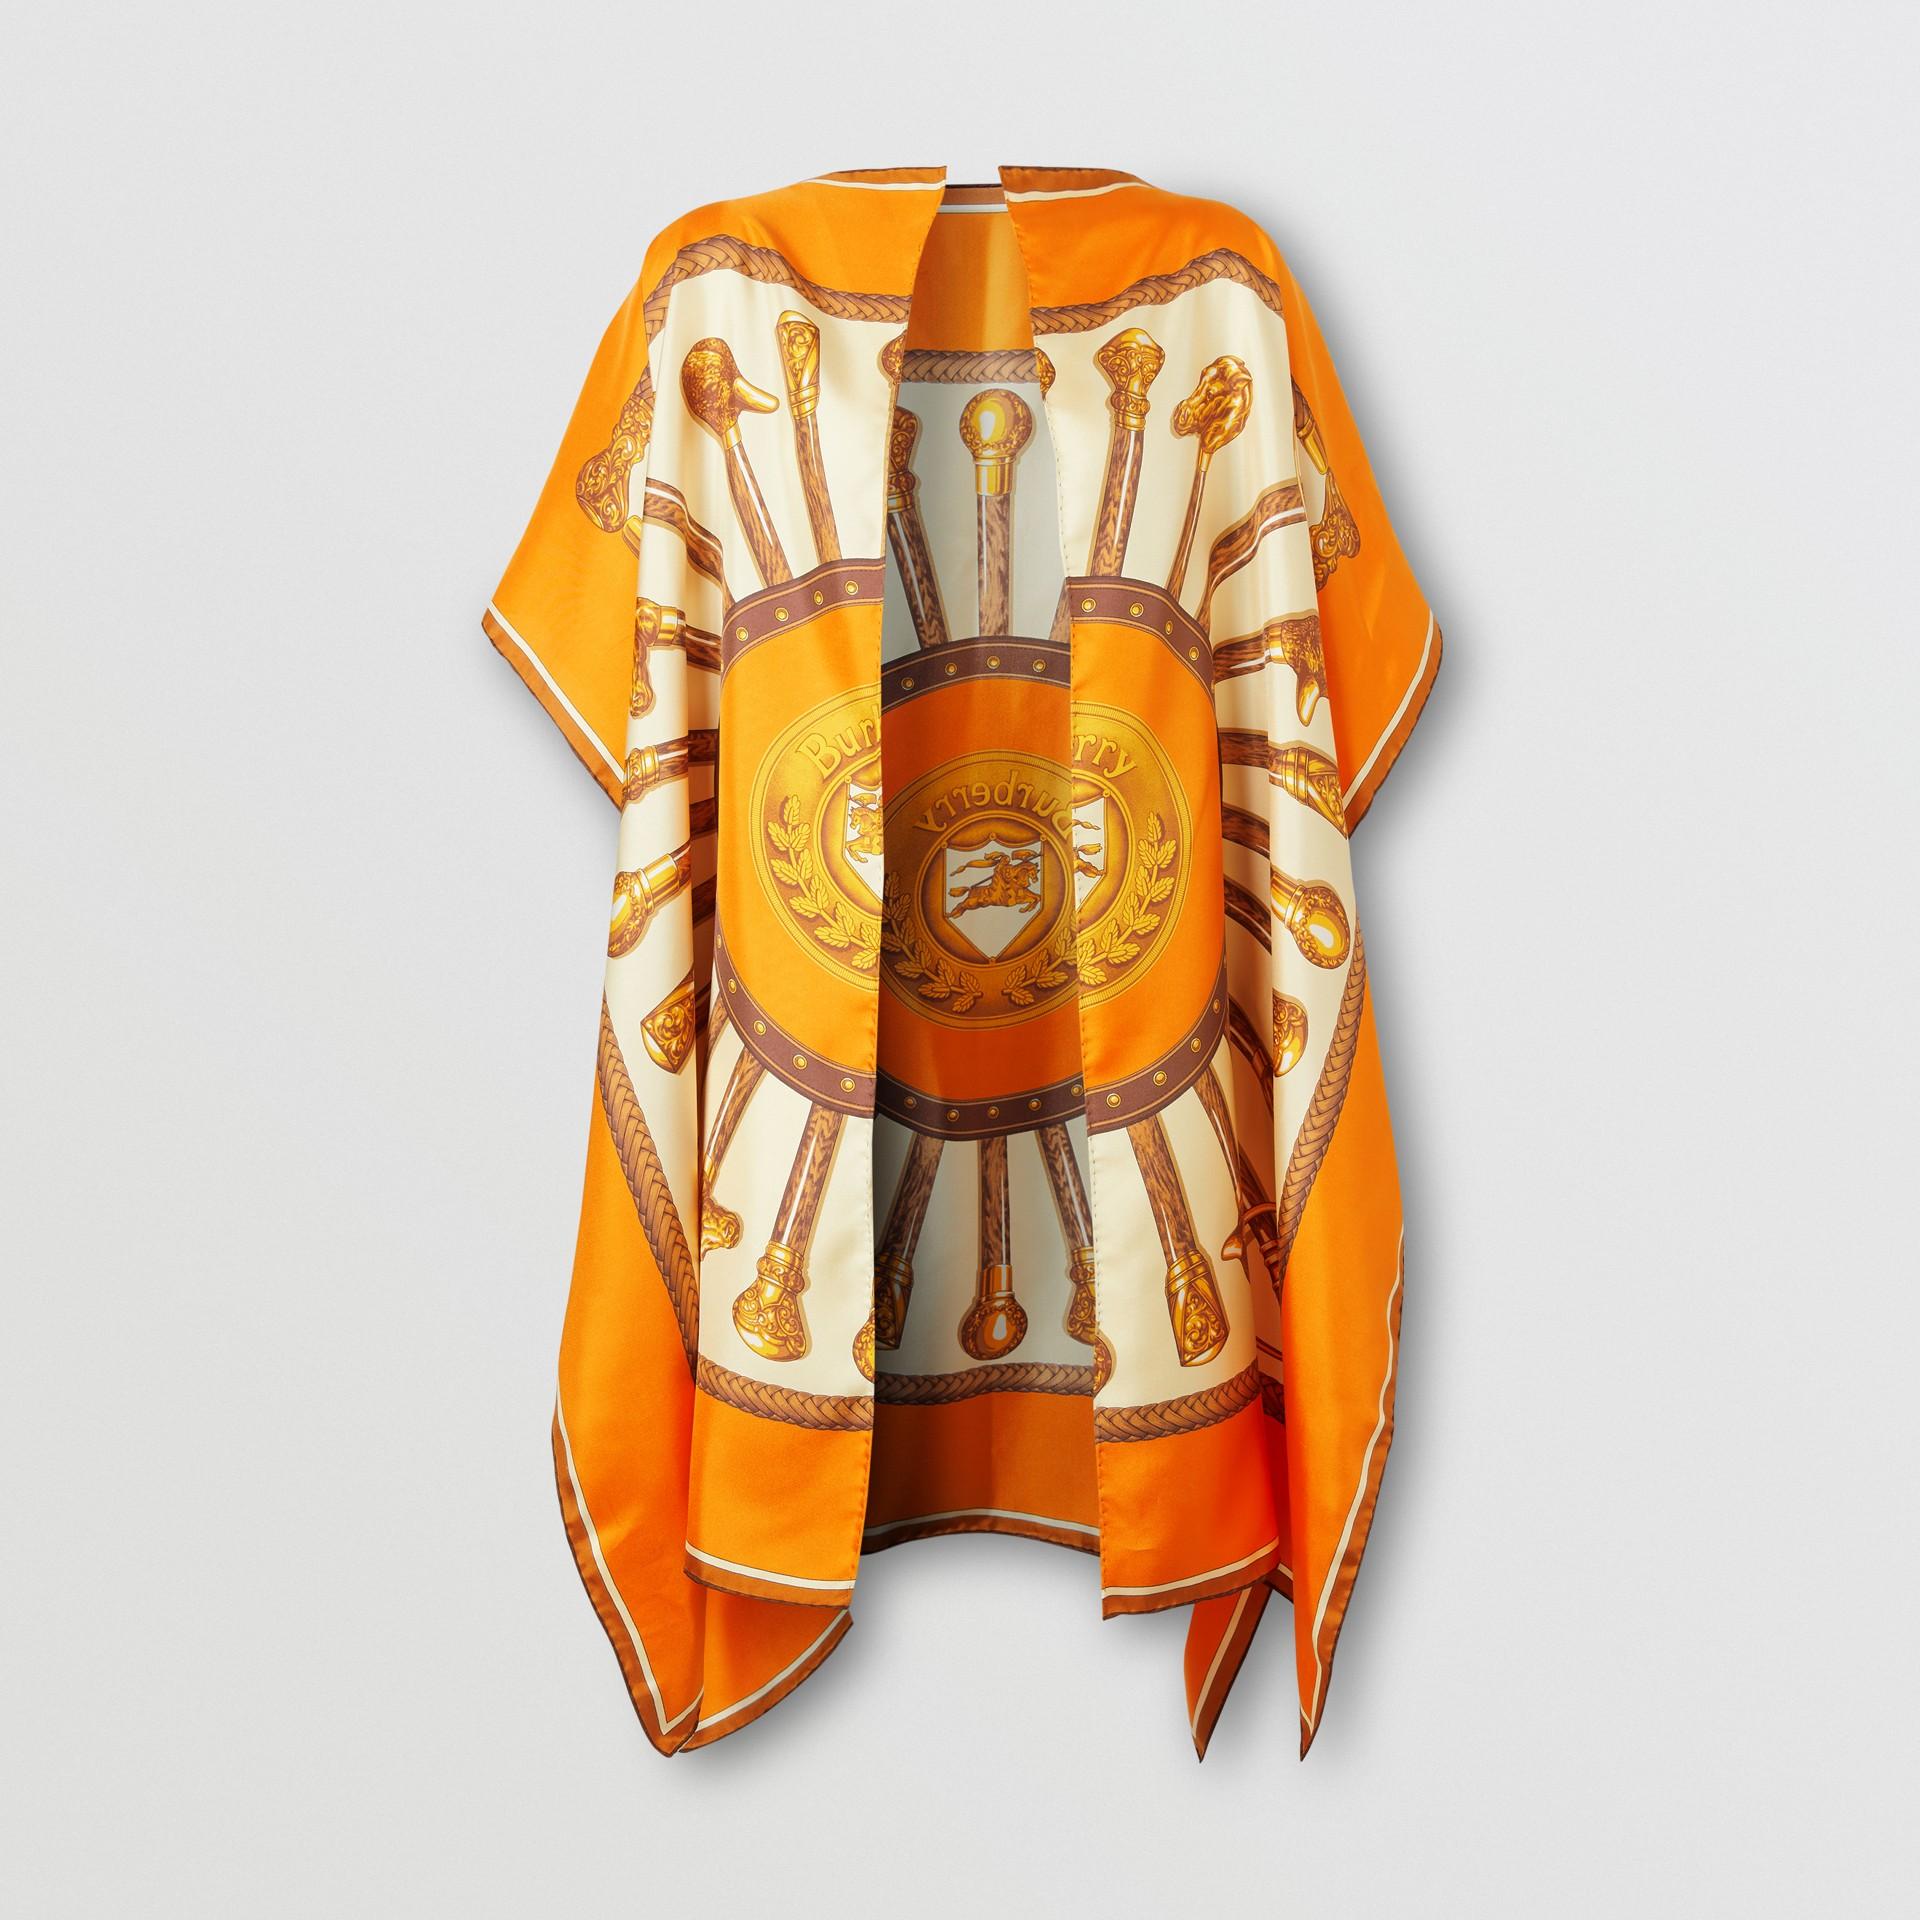 Archive Scarf Print Silk Twill Cape in Bright Orange - Women | Burberry - gallery image 3